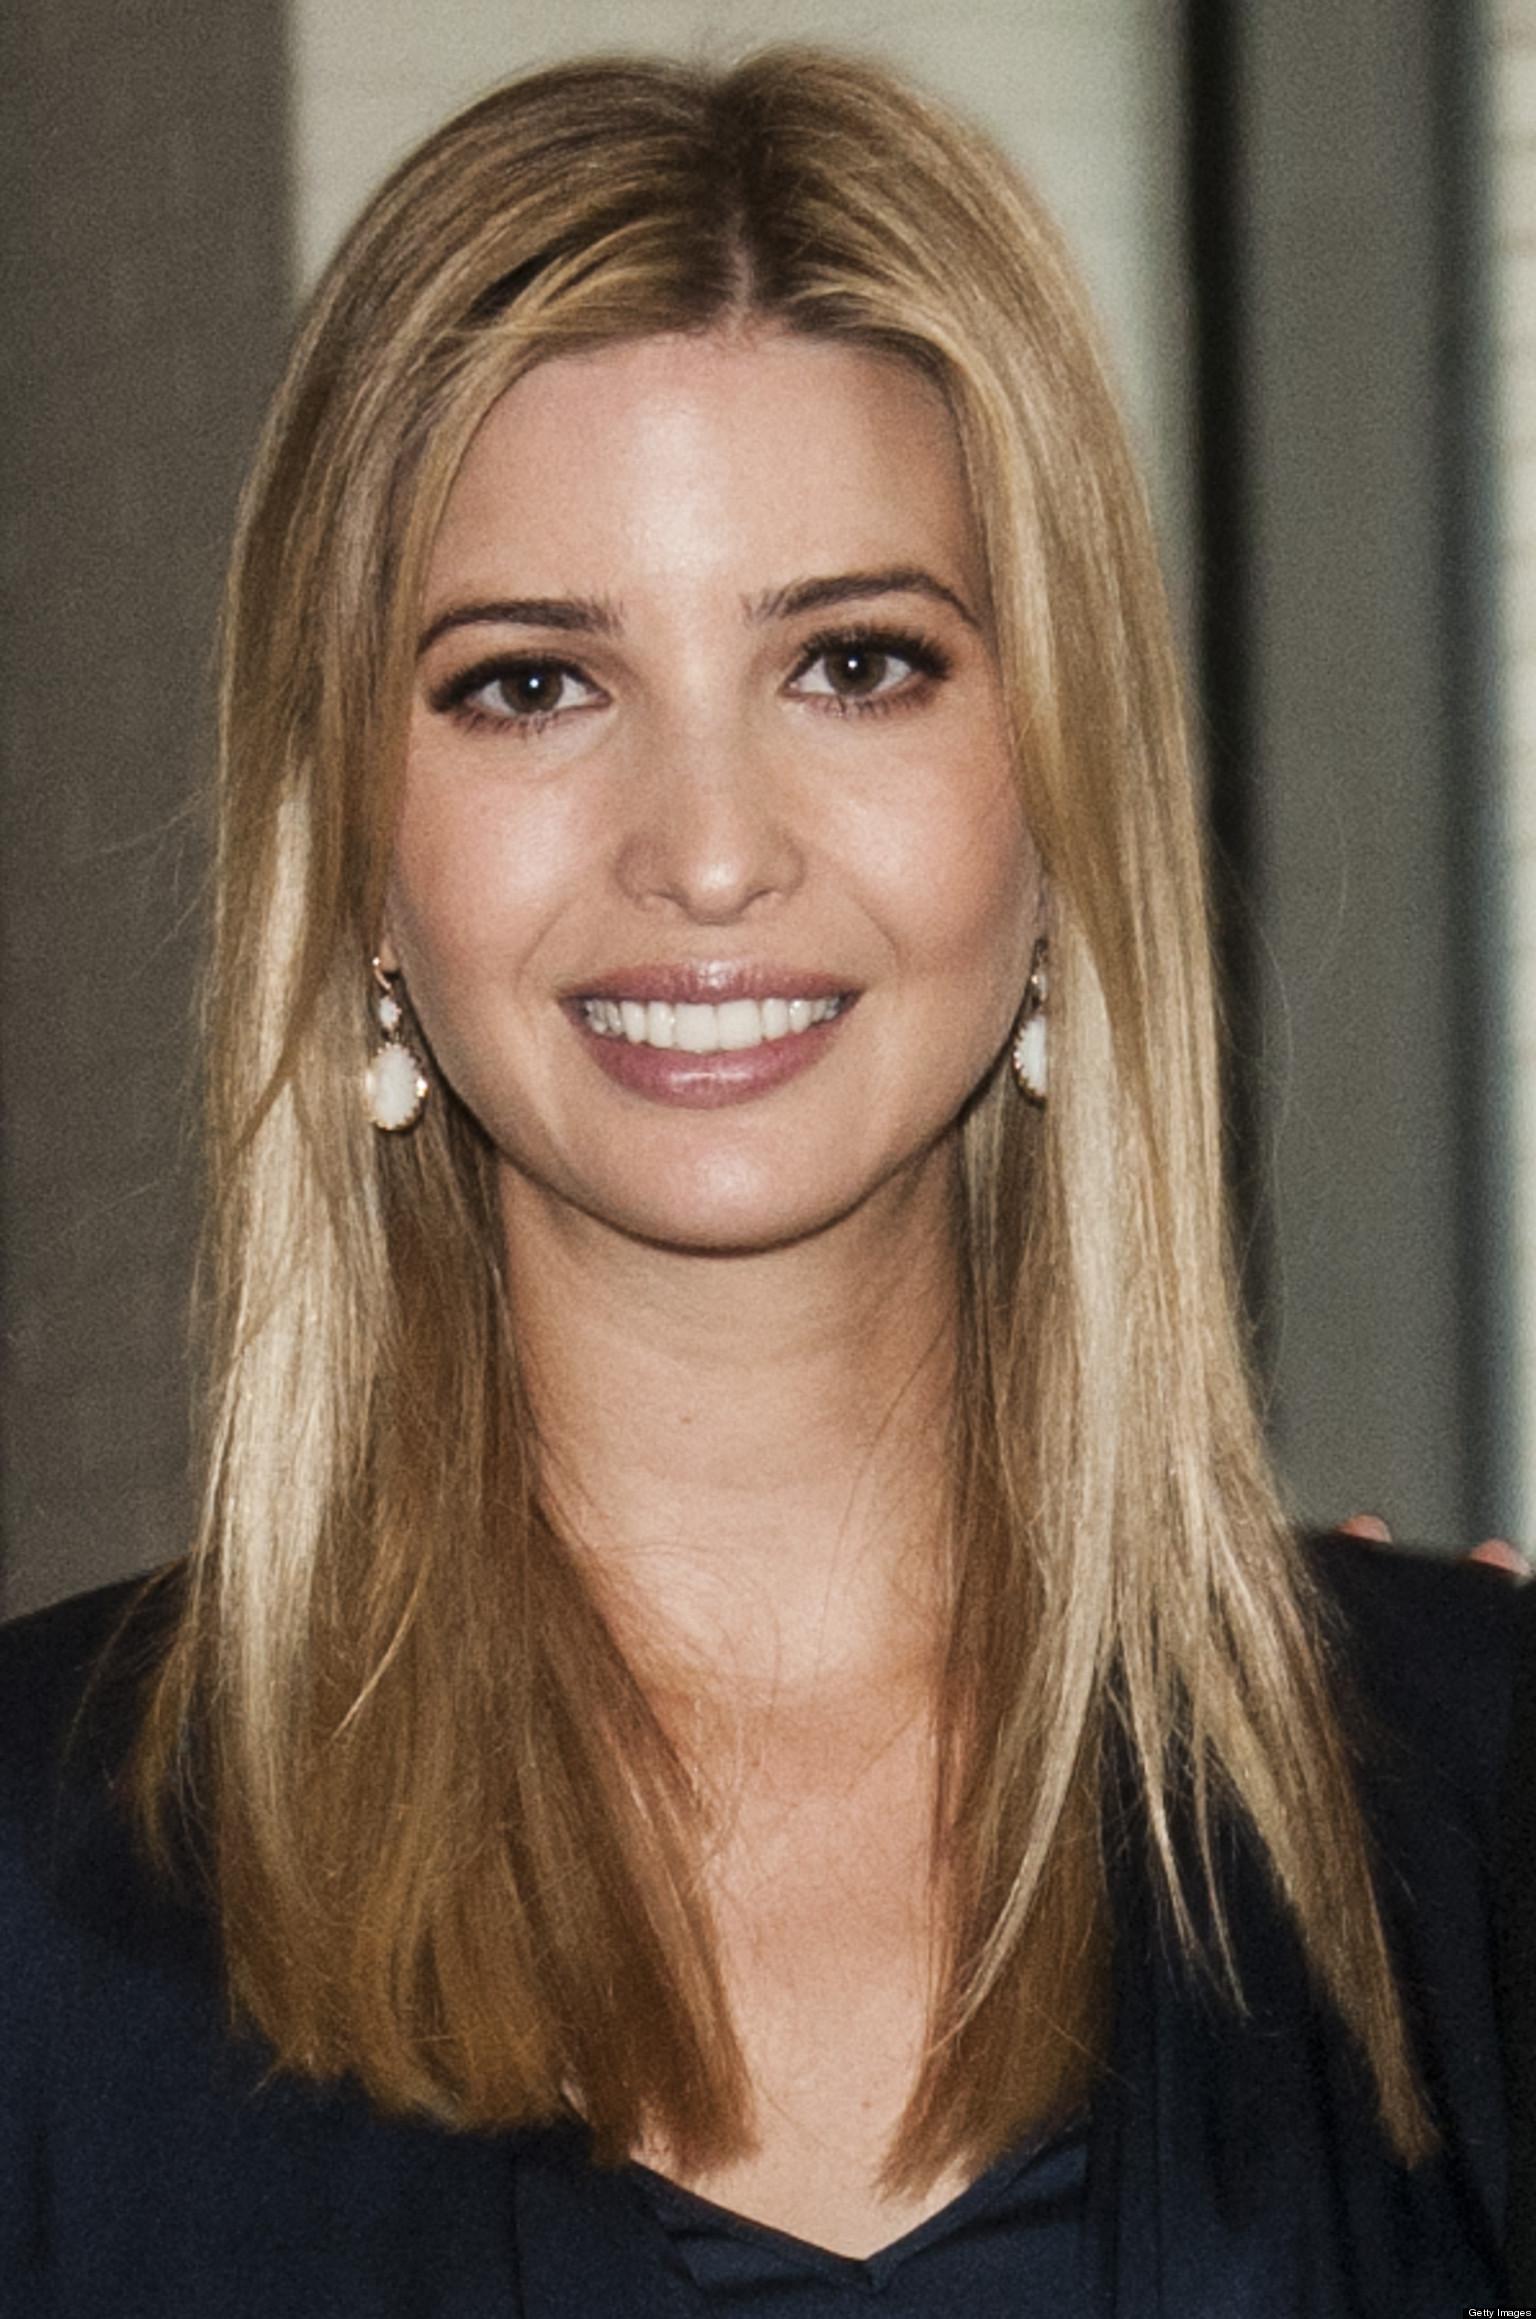 Bien maquillada  Maquillajes que inspiran  Ivanka TrumpIvanka Trump 2013 Hair